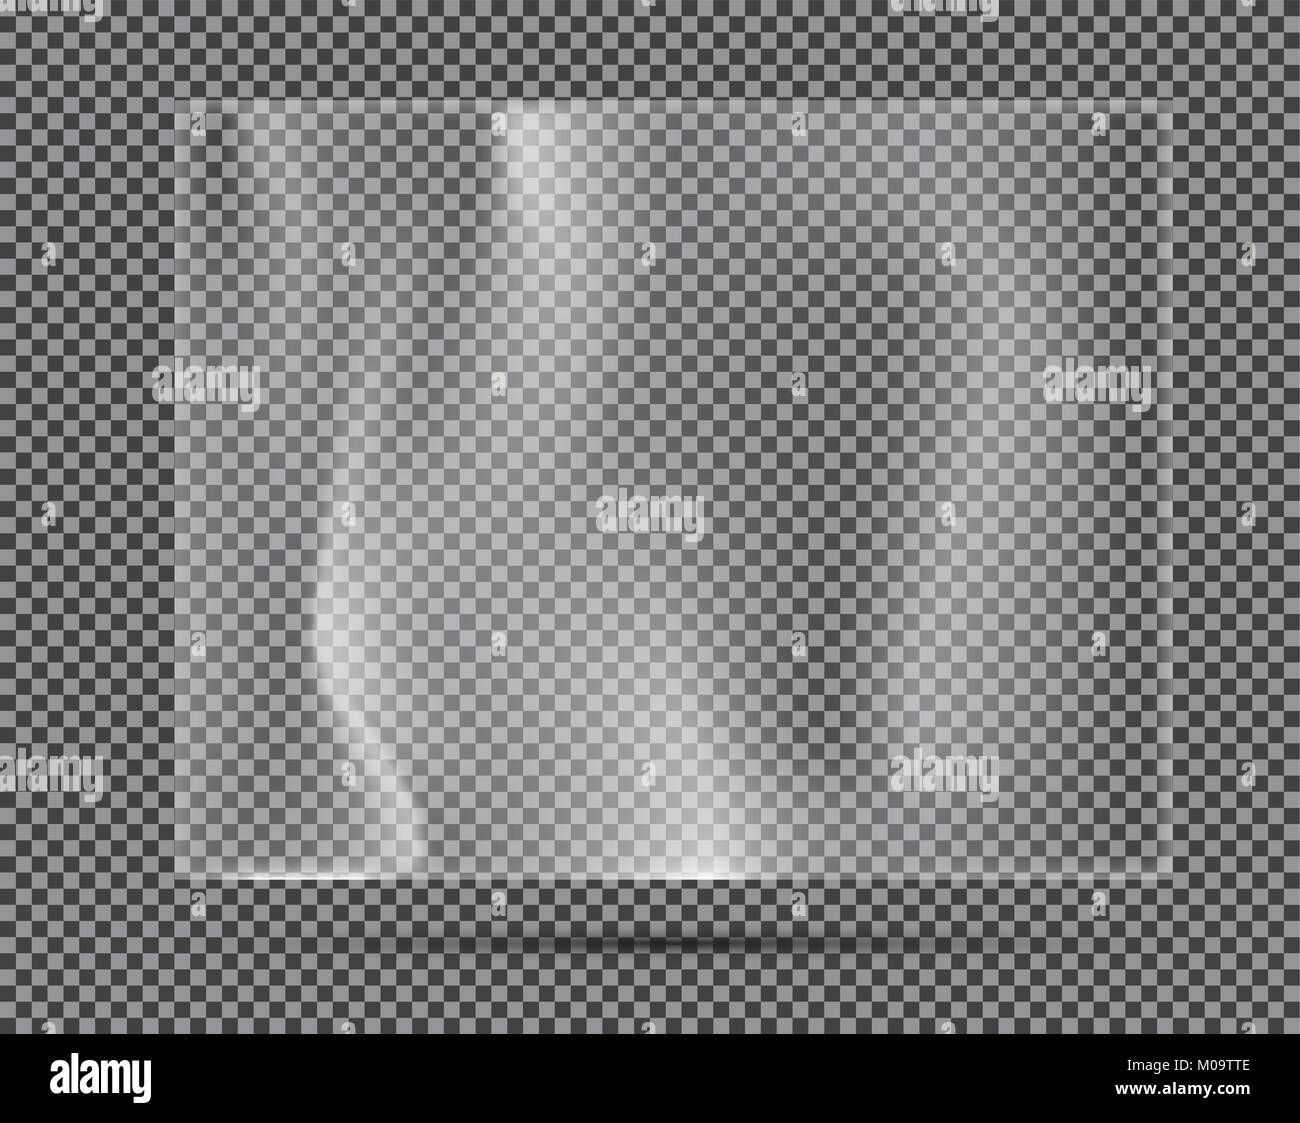 Transparent Light Polyethylene Banner. Vector Illustration. - Stock Vector